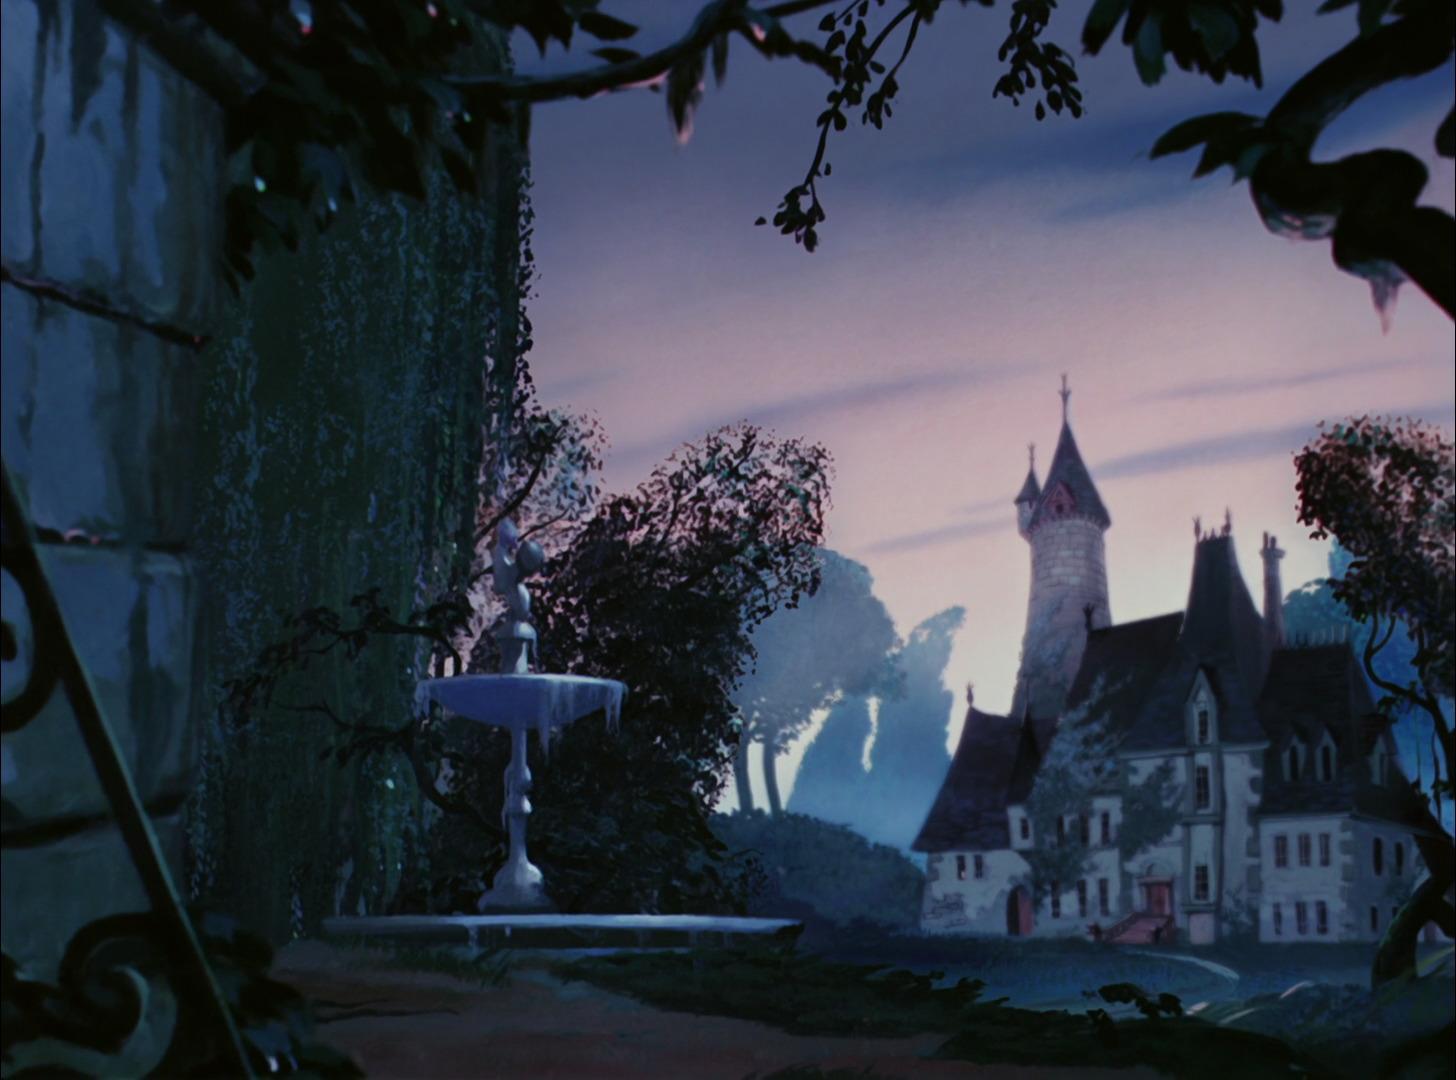 File:Cinderella's House.jpg